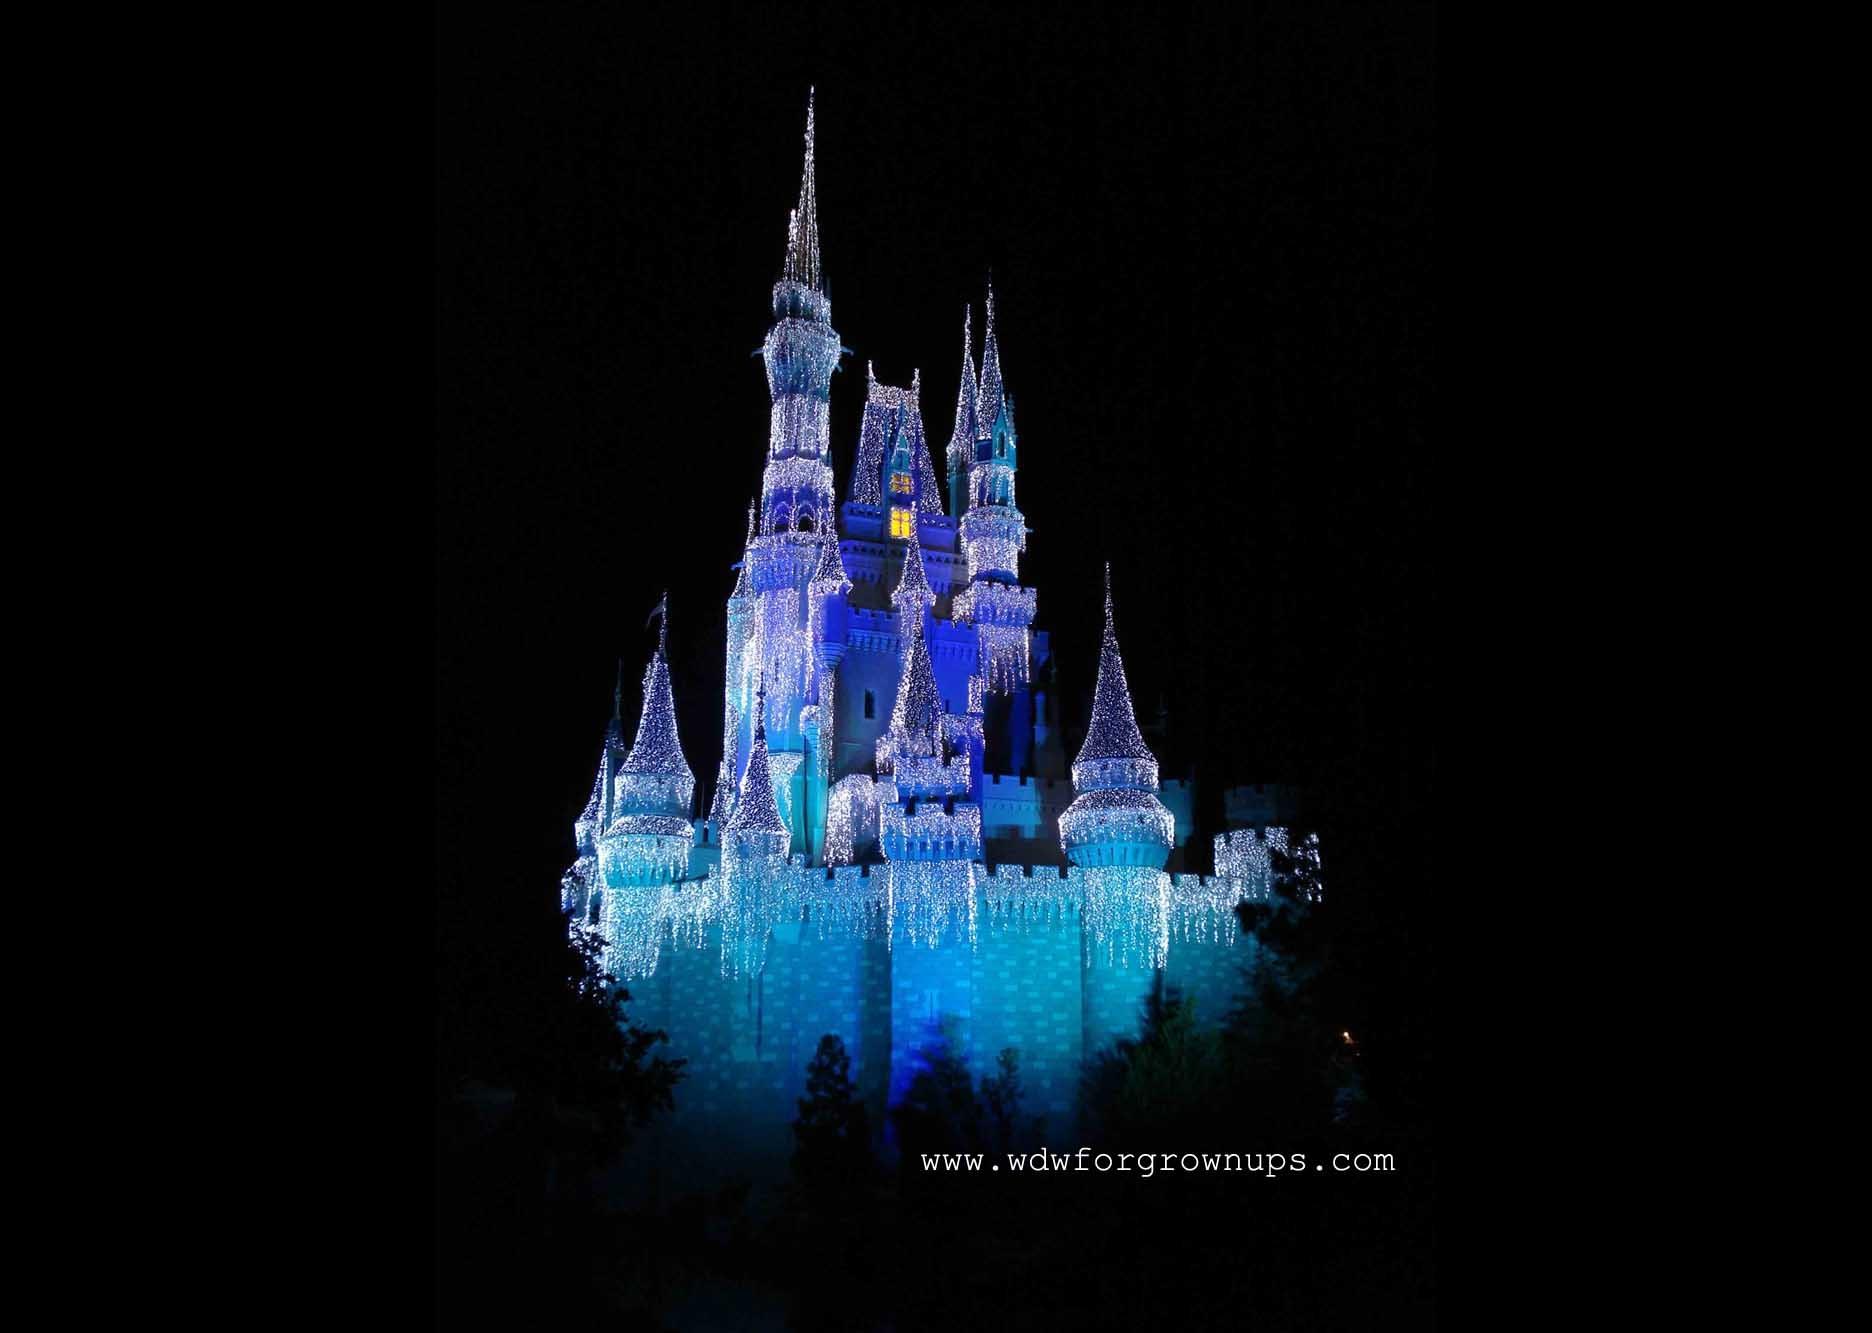 Disney Desktop Wallpaper Walt Disney World For Grownups 1872x1333